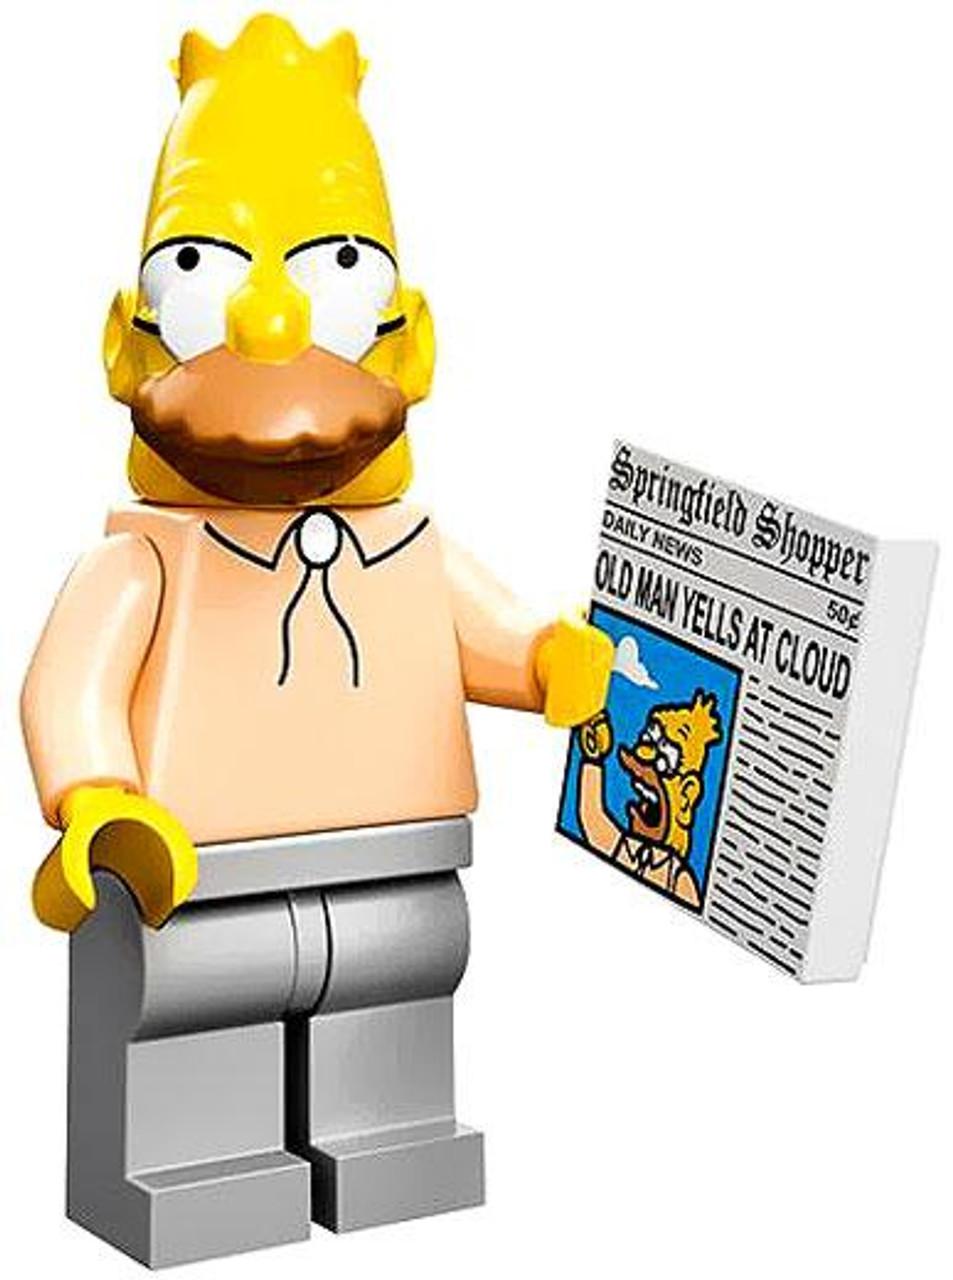 LEGO The Simpsons Simpsons Series 1 Grampa Abe Simpson Minifigure [Loose]